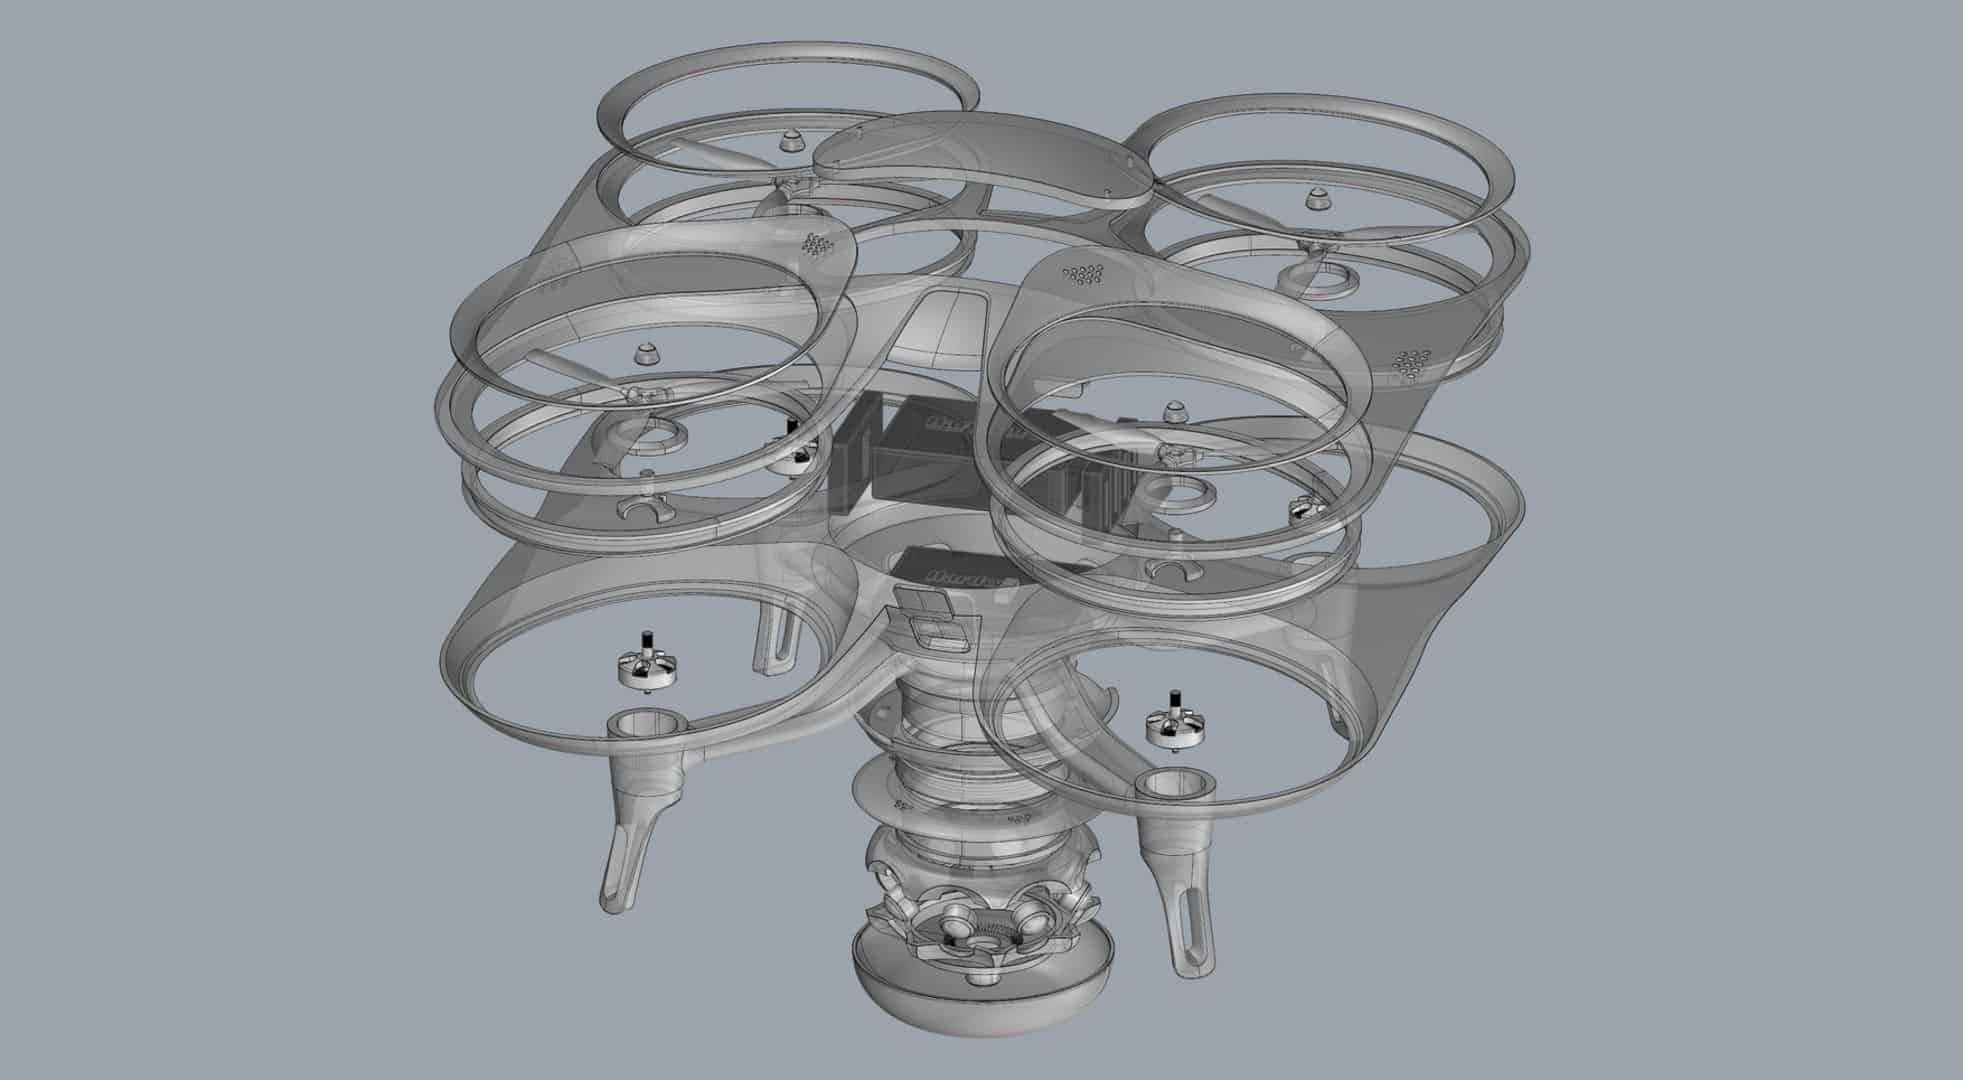 DNDN A Public Drone Safety Escort Service 22